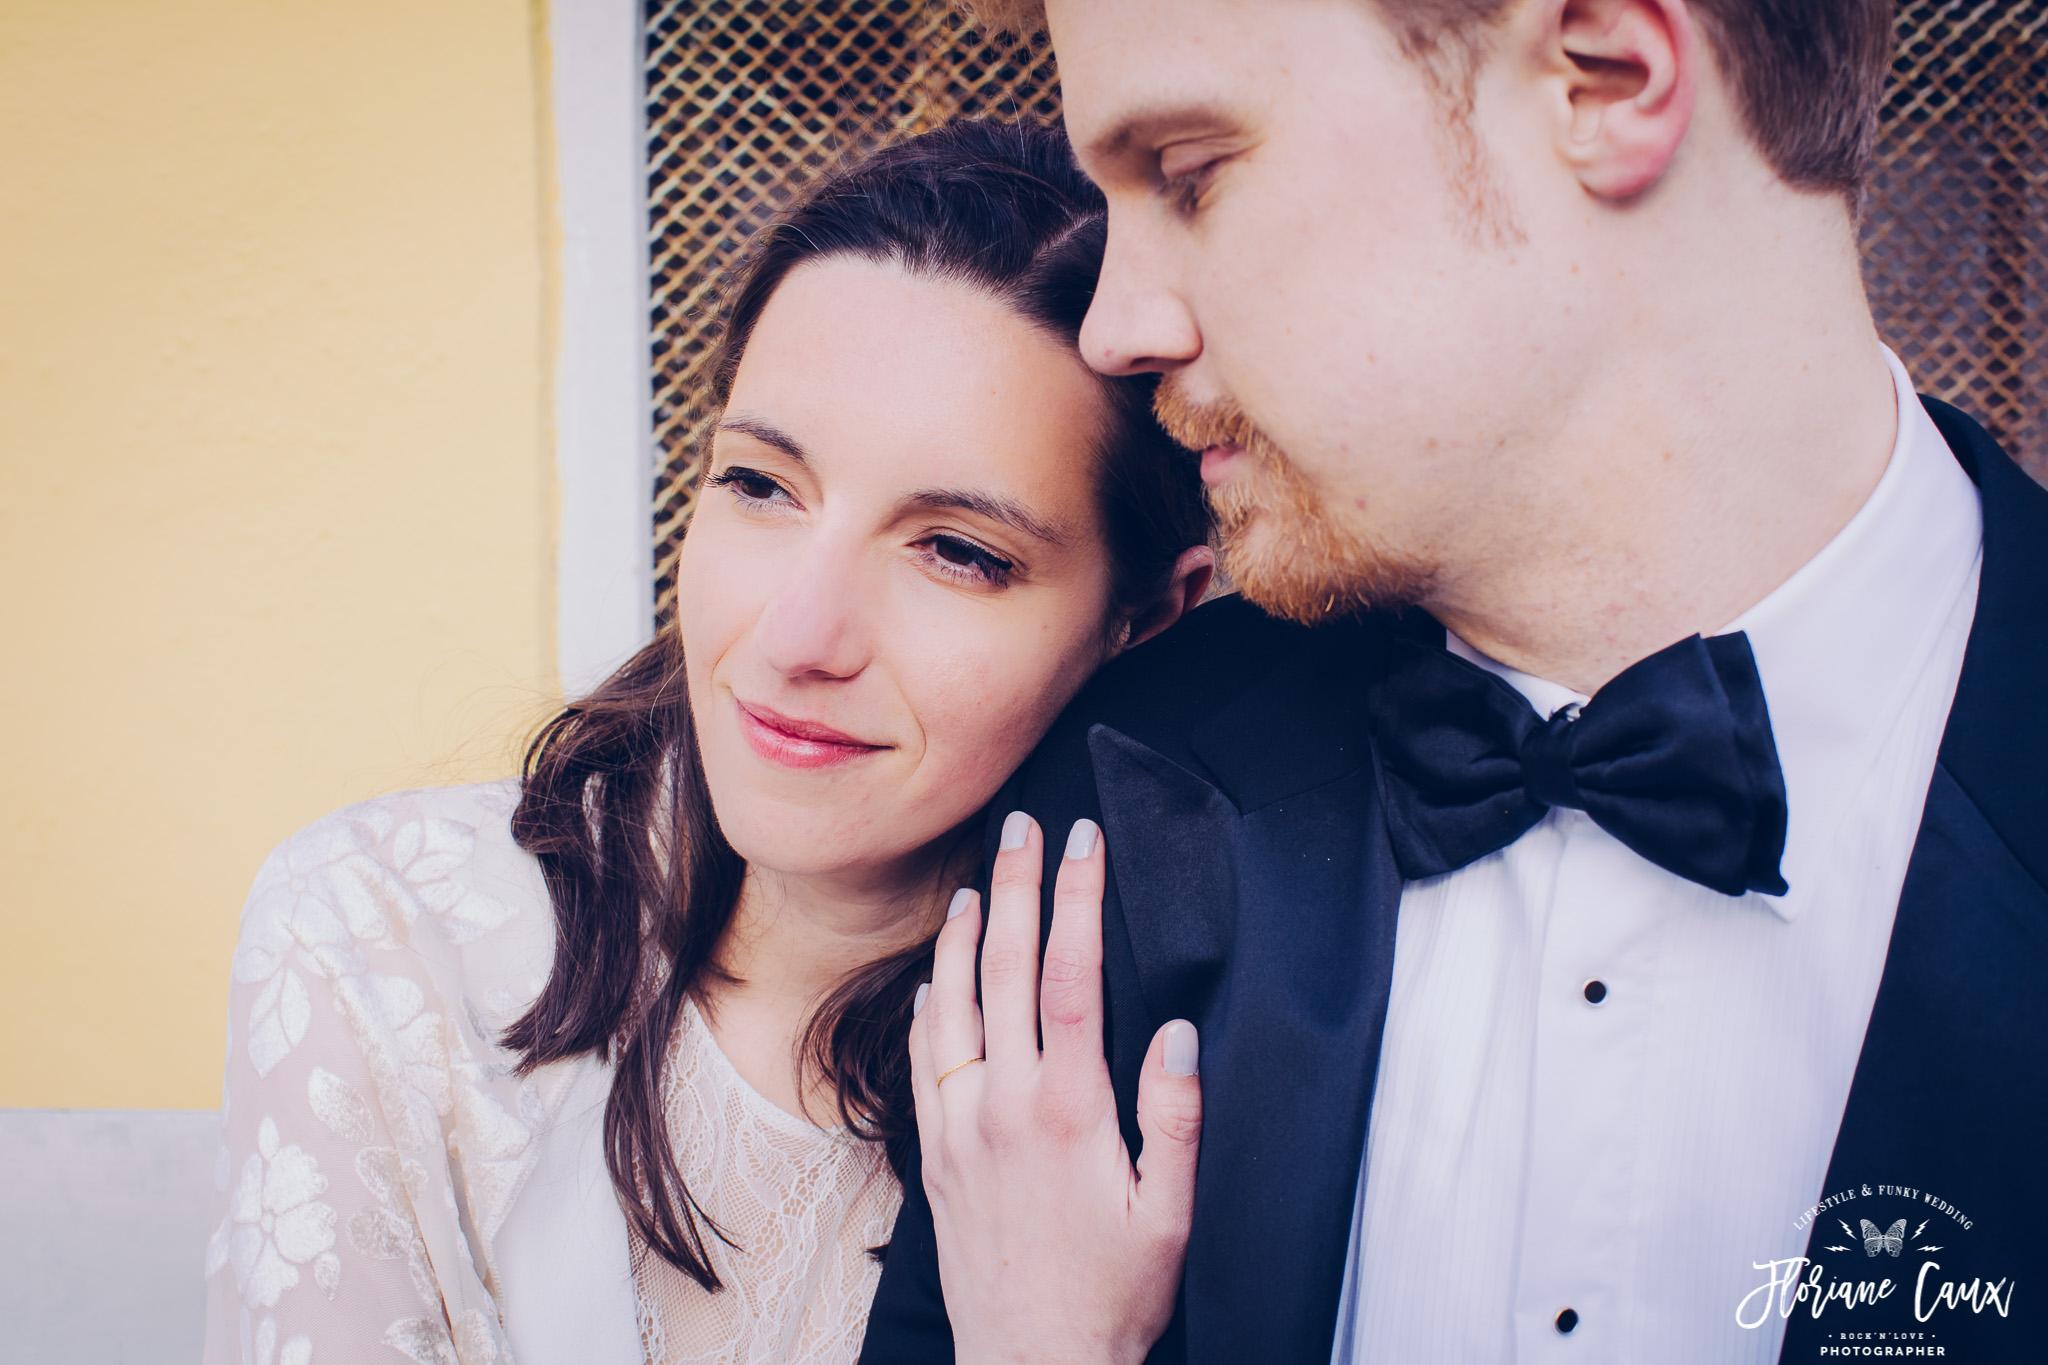 destination-wedding-photographer-oslo-norway-floriane-caux-18